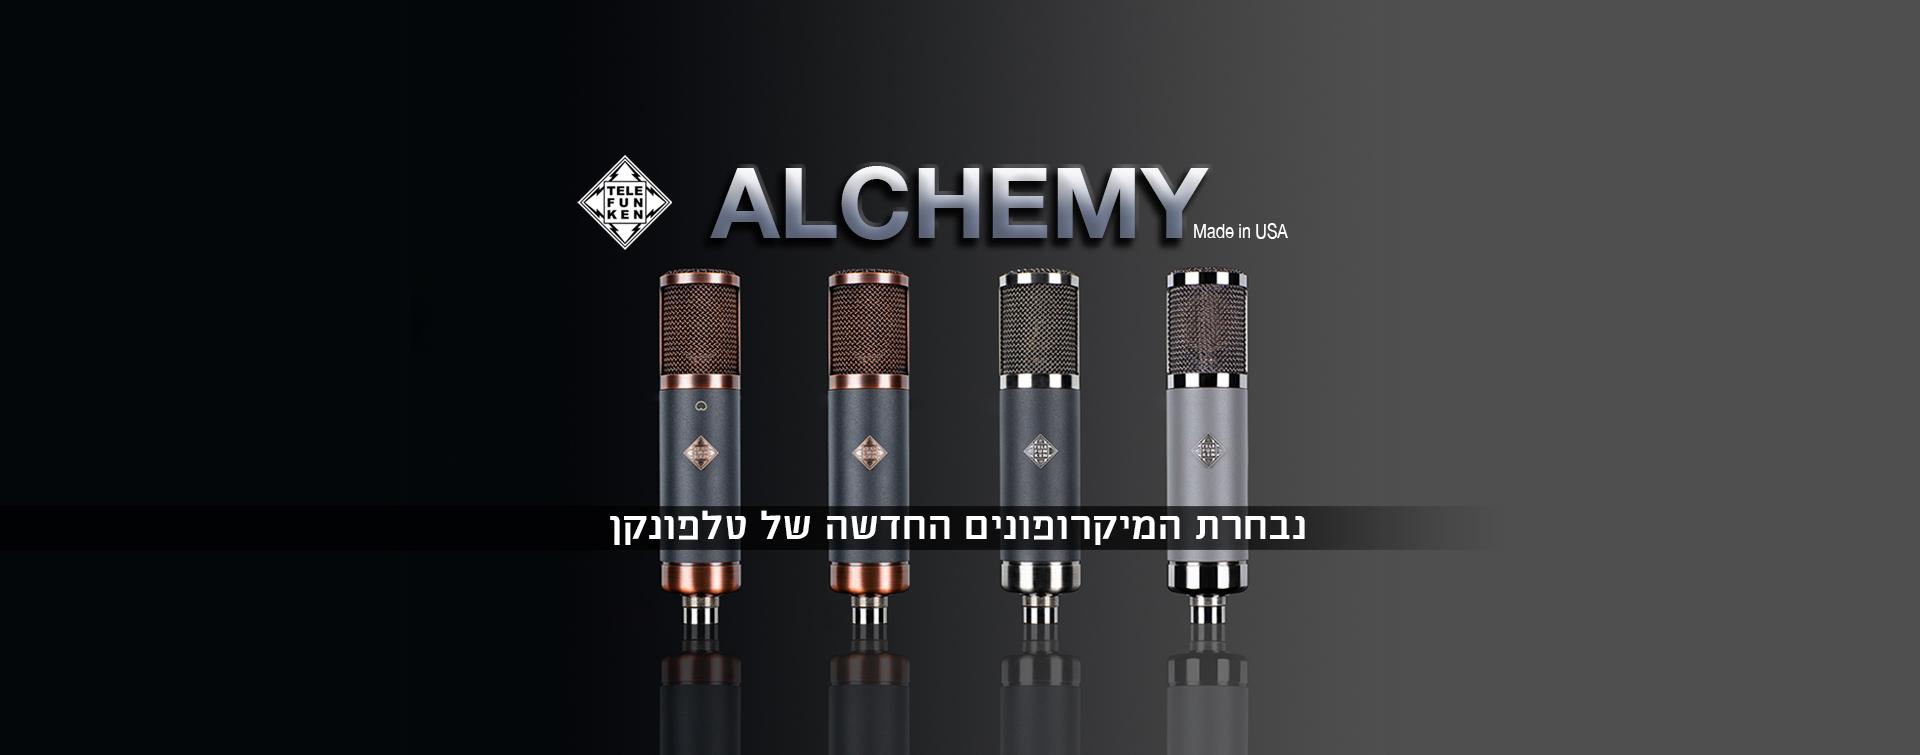 telefunken Alchemy